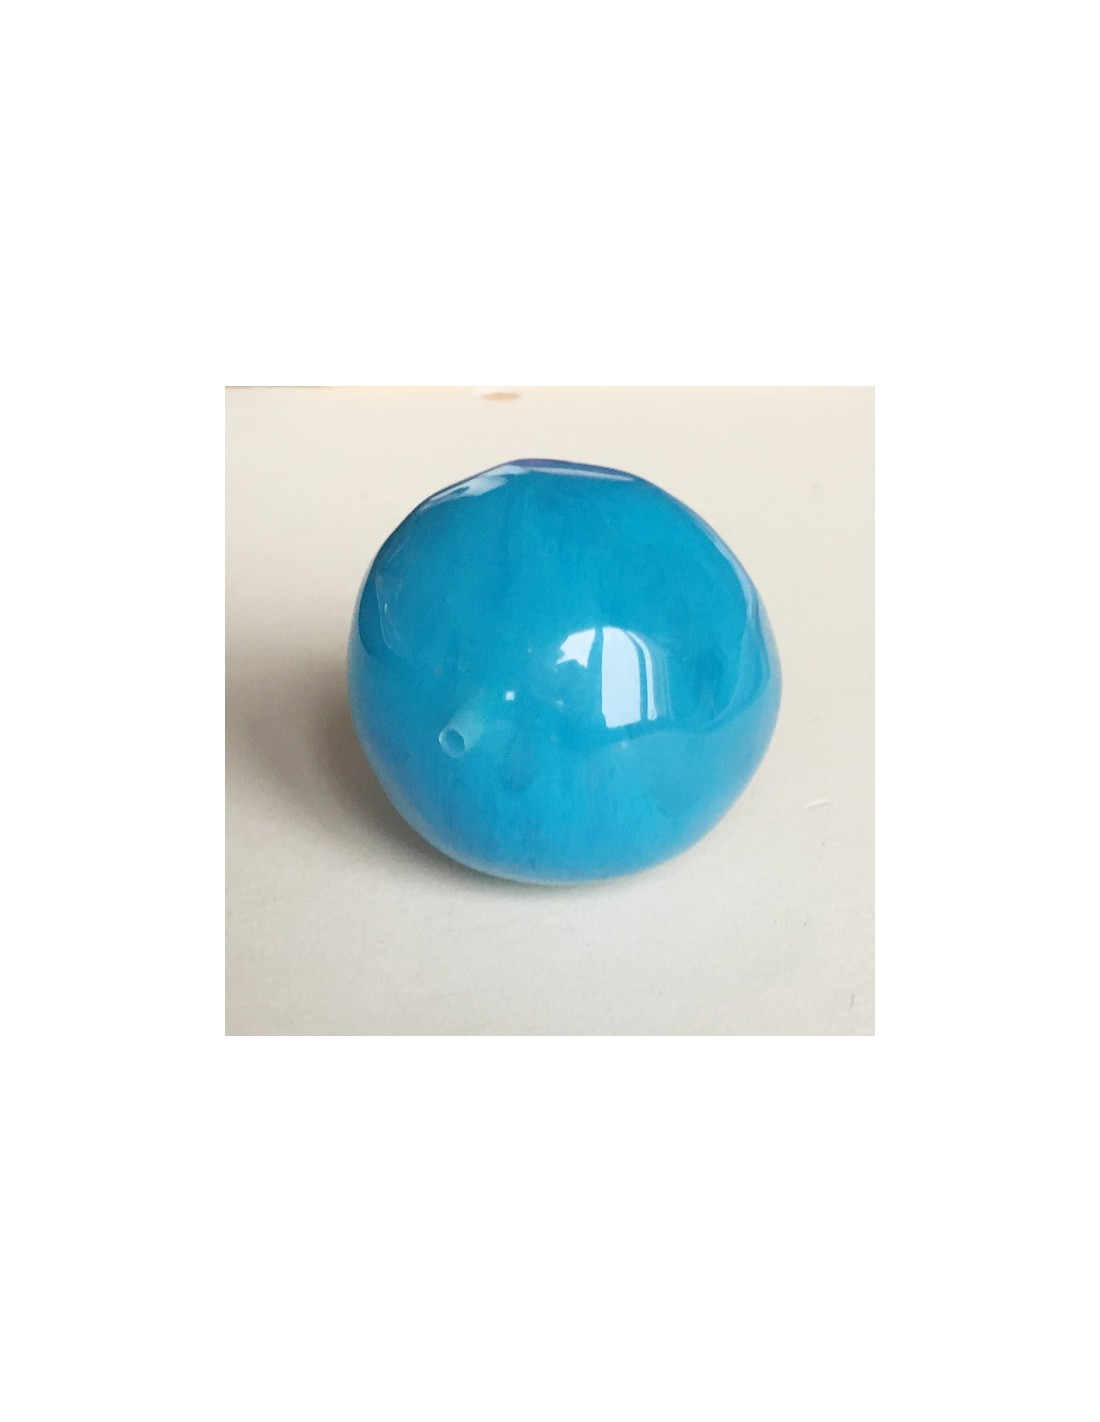 Grande perla azzurra in resina effetto vetro tonda irregolare 30 mm